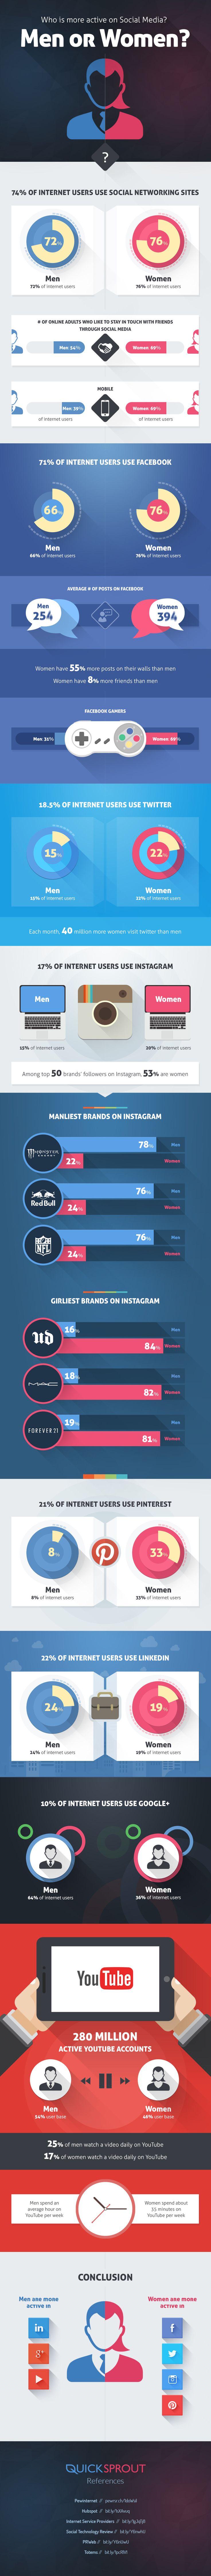 Who Is More Active on Social Media? Men or Women? - #infographic #SocialMedia